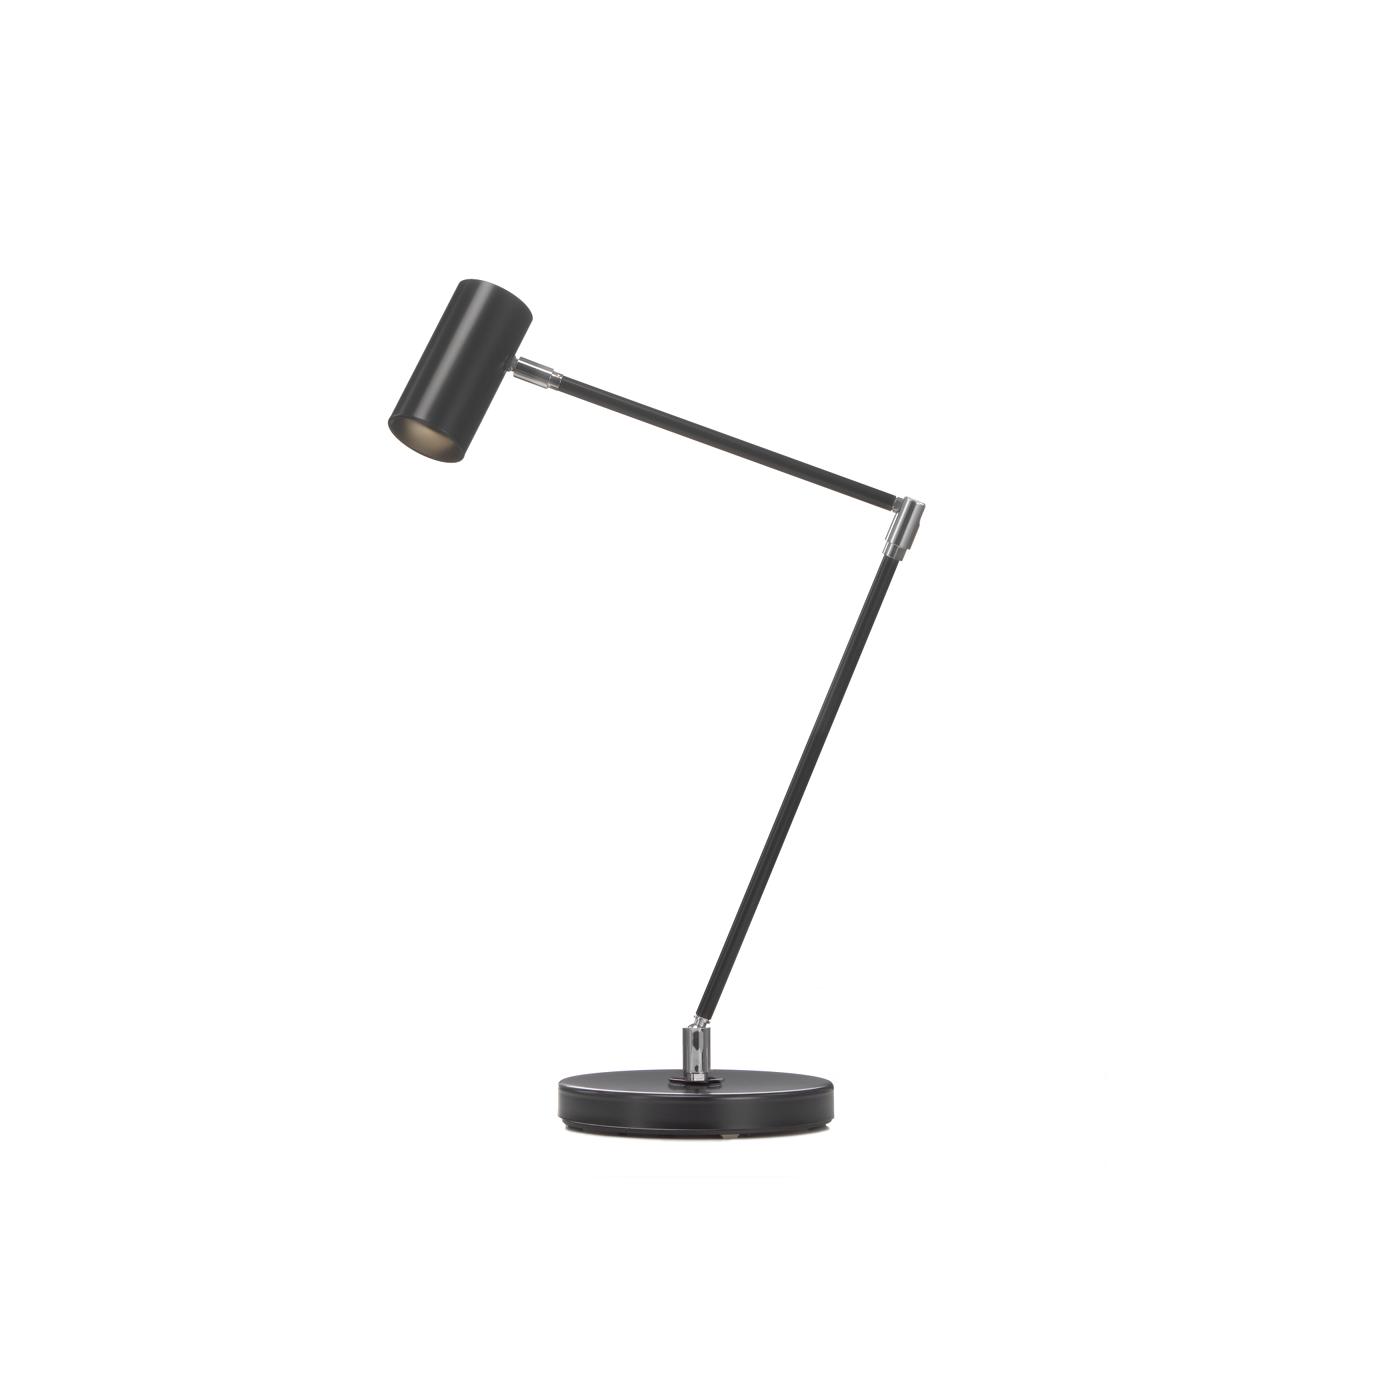 MINIPOINT bordslampa Svart. Örsjö belysning thumbnail